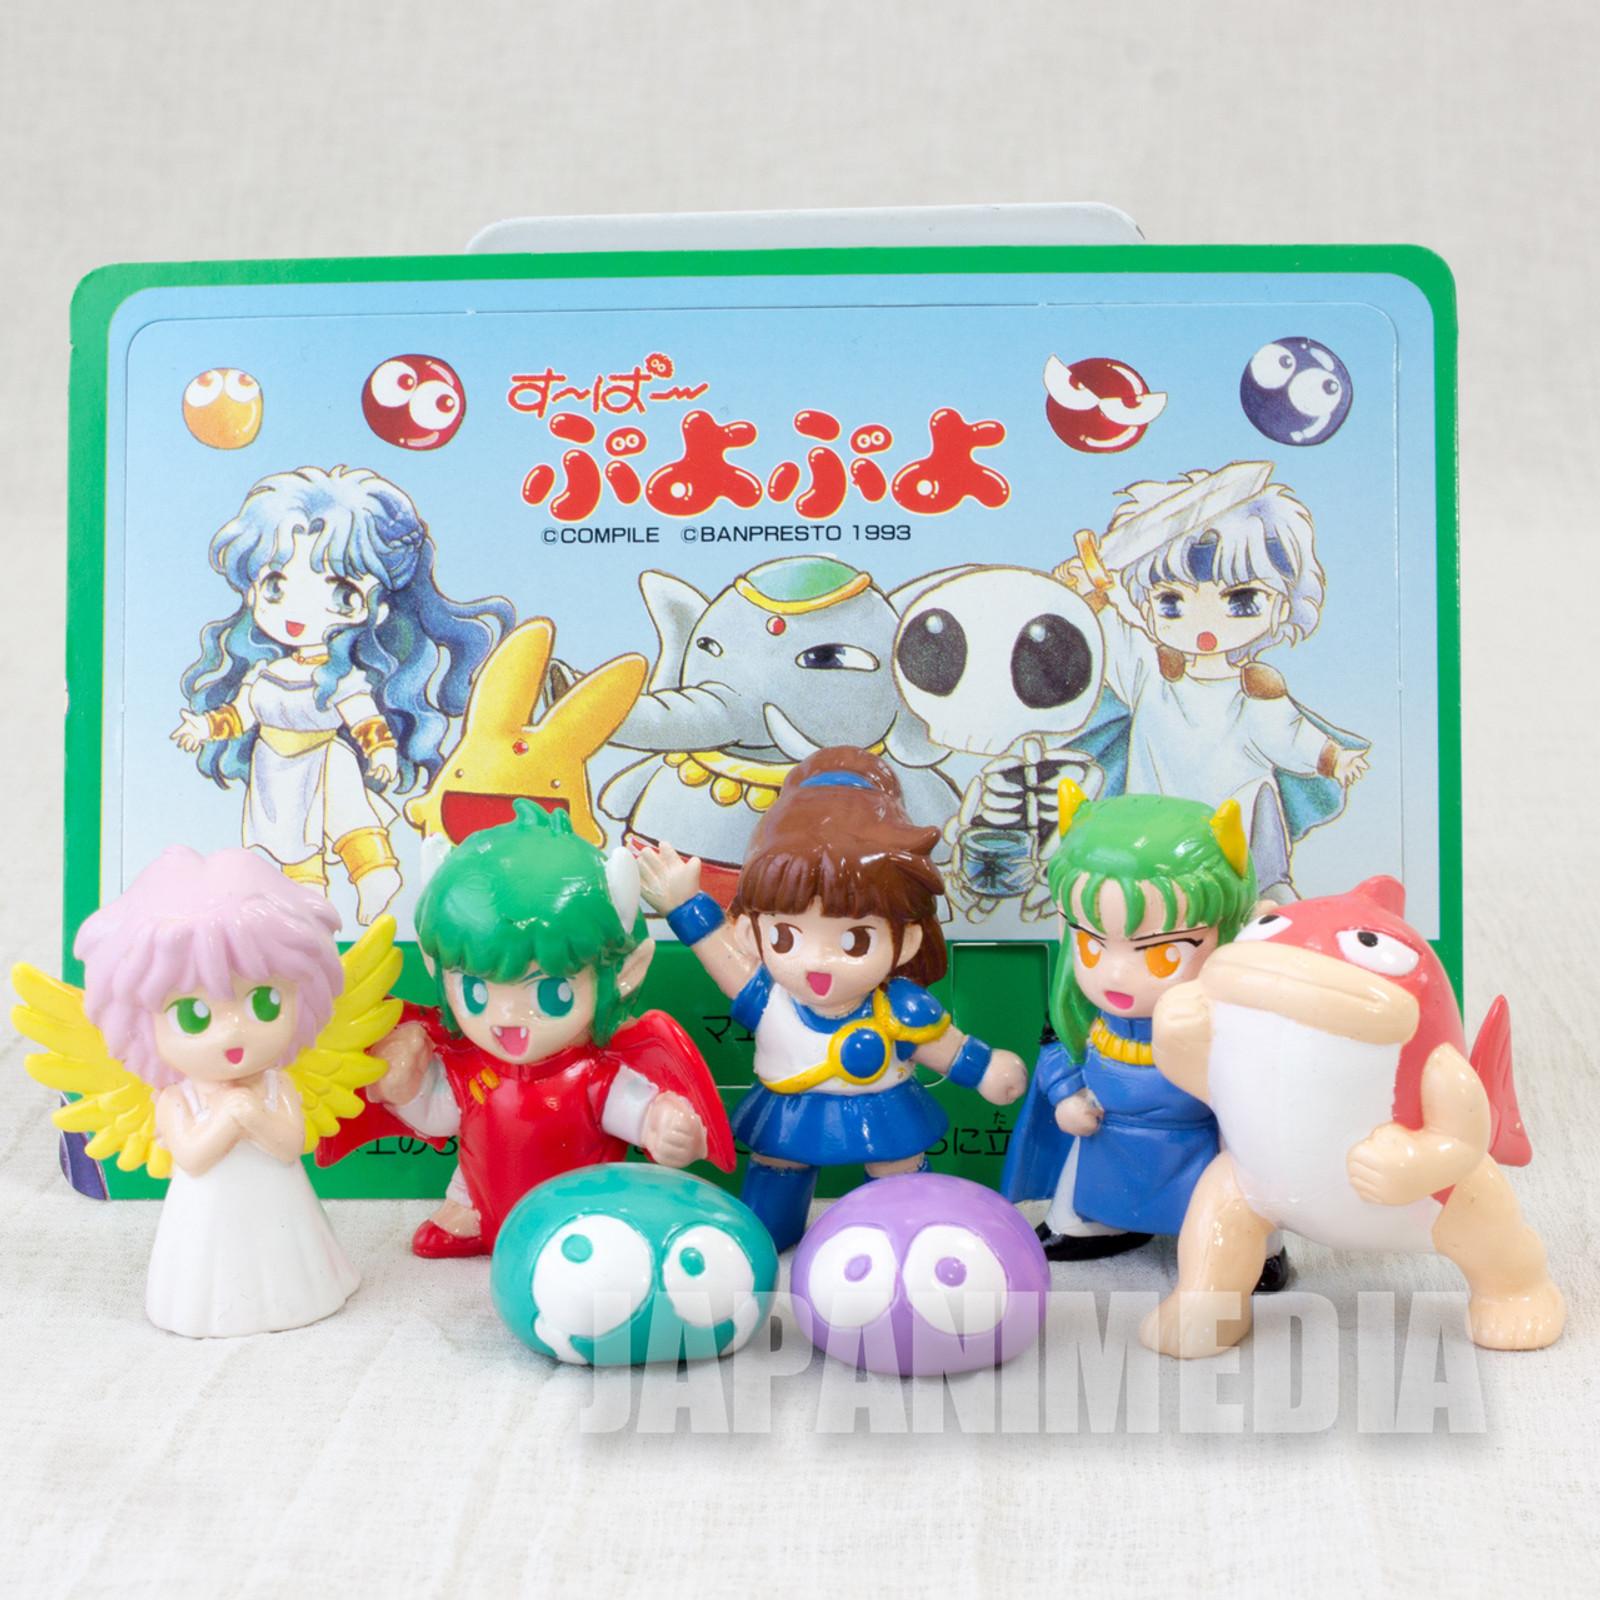 Retro RARE Puyo Puyo Pocket Hero Mini Figure Set Yutaka 1994 JAPAN GAME COMPILE